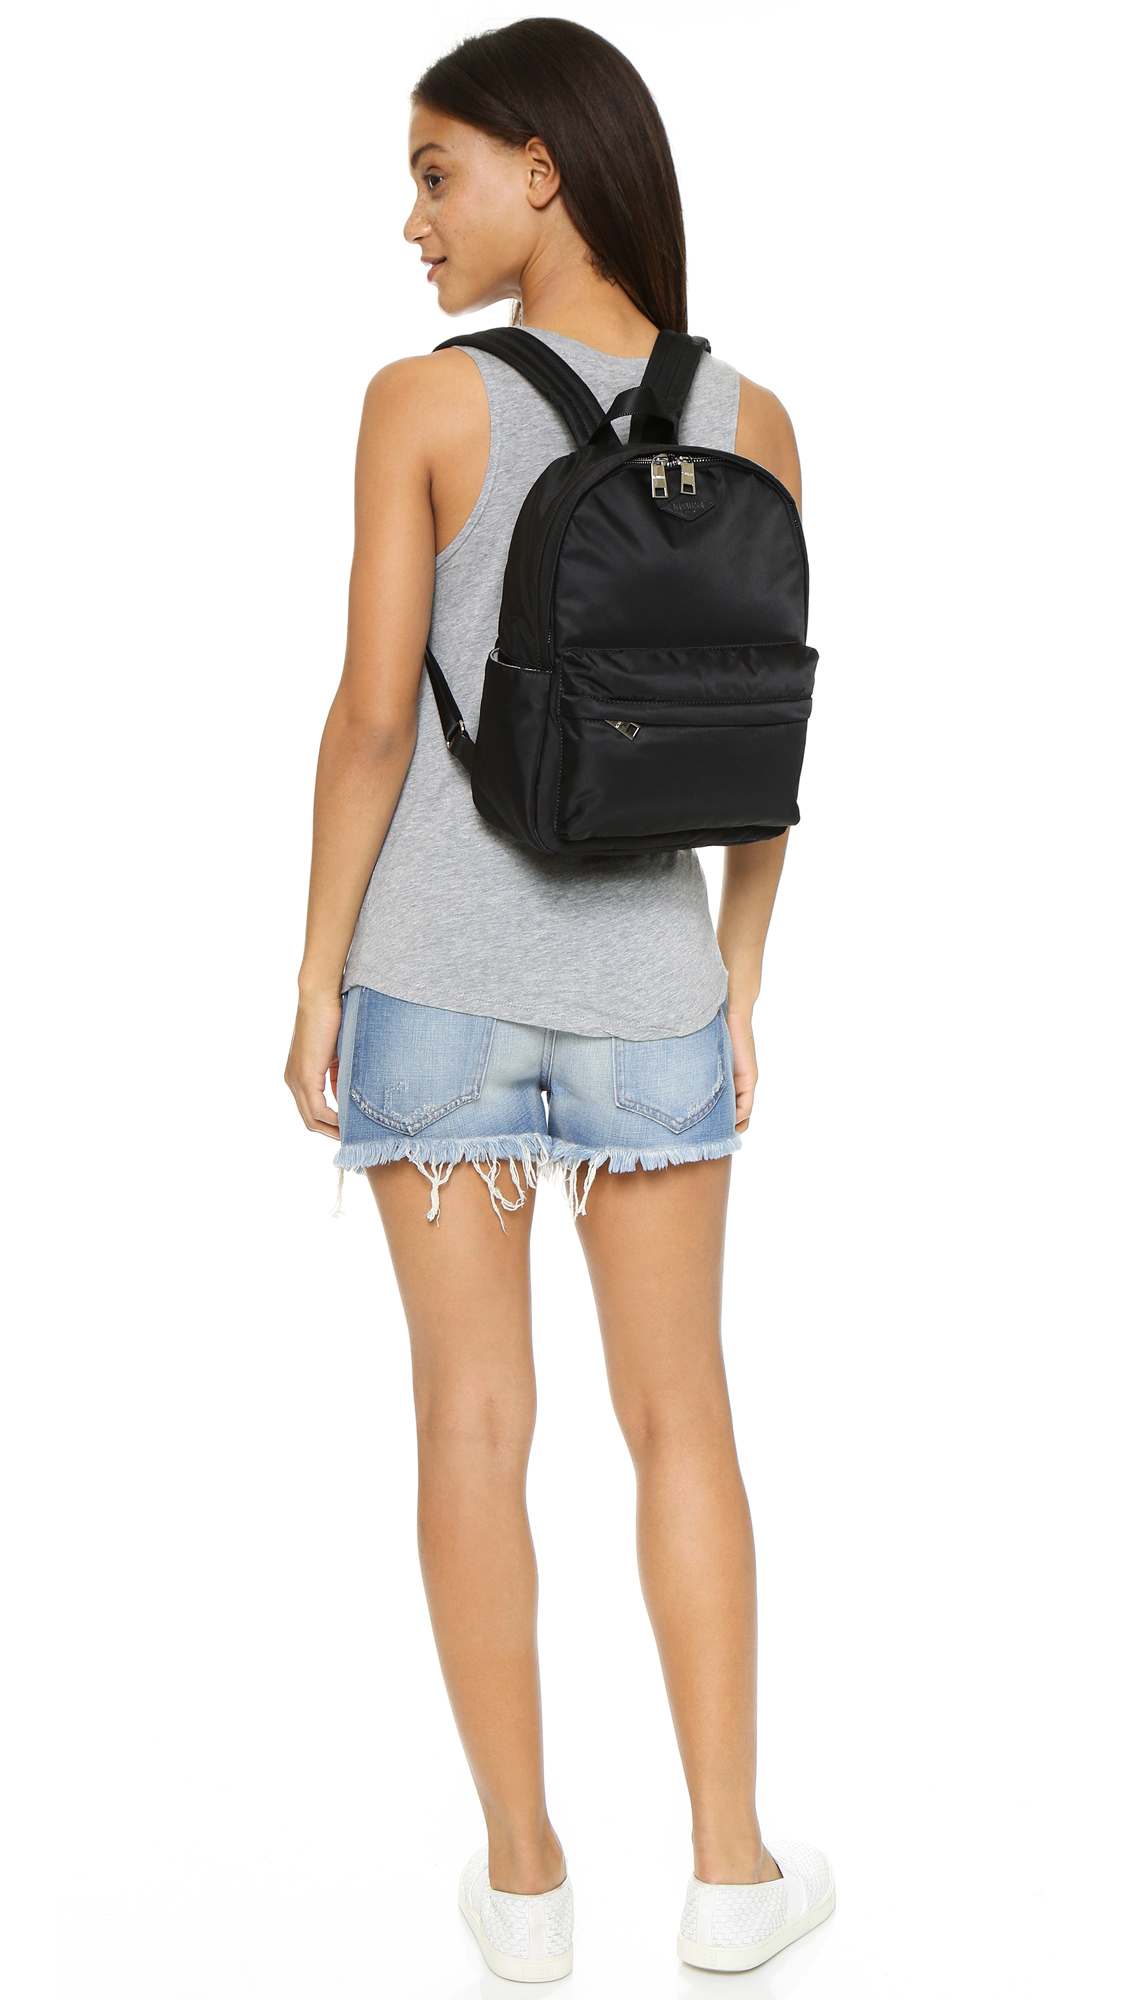 681d3dfa76 MZ Wallace Jeni Backpack